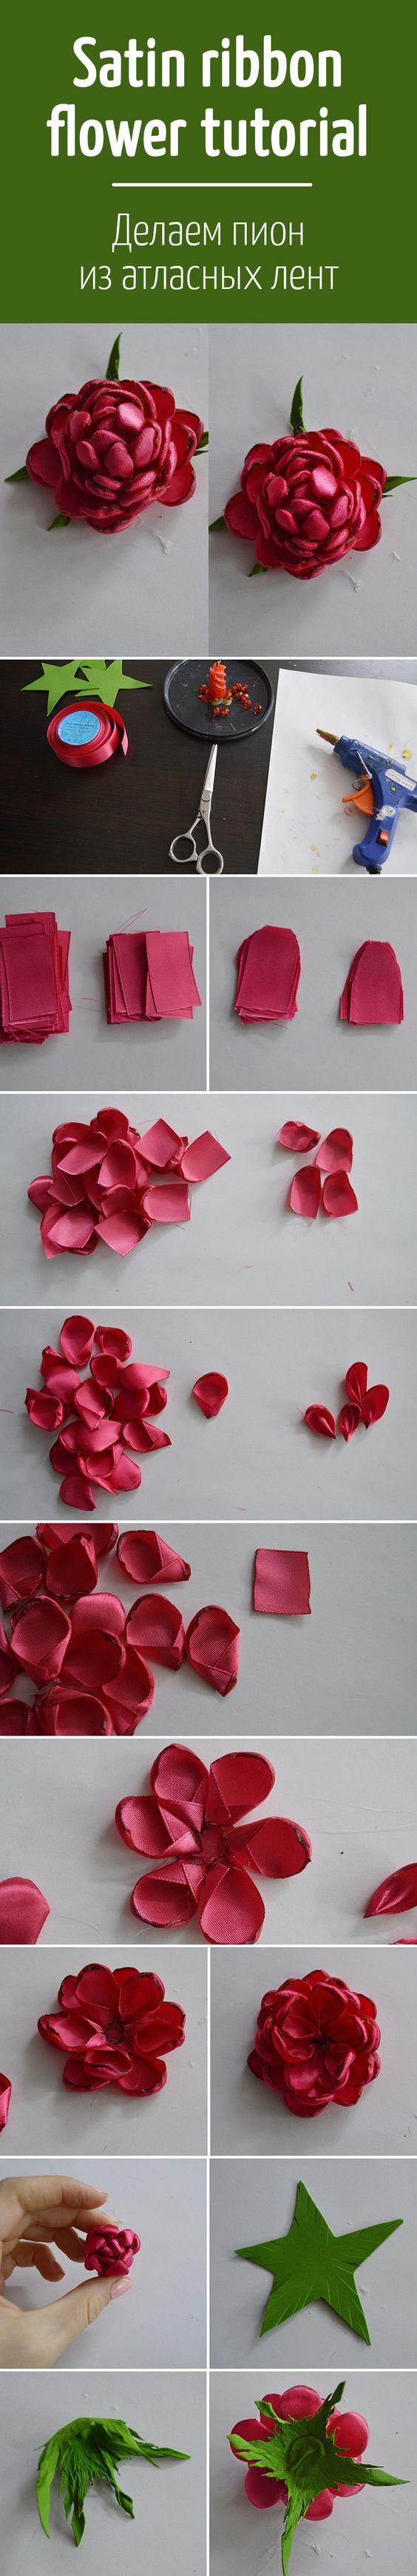 Цветы из лент ютуб